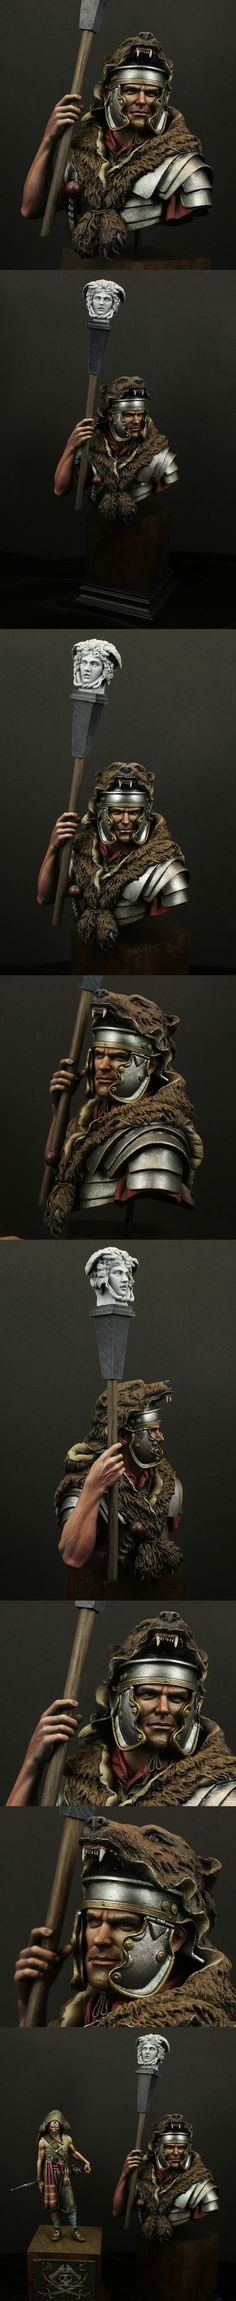 ROMAN SIGNIFER 1st Century A.D